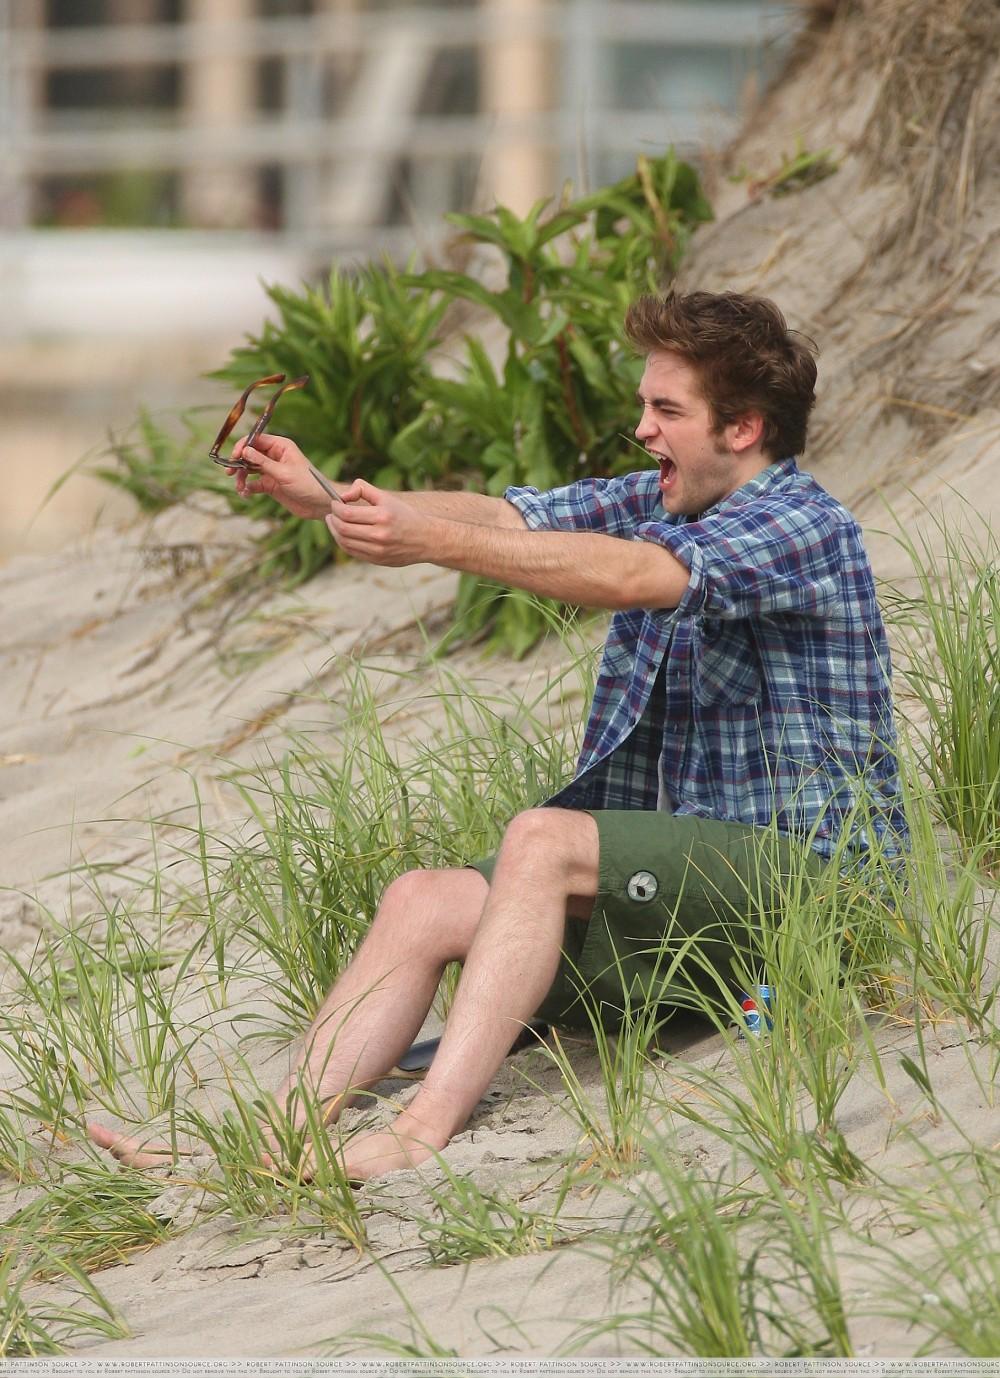 Robert Pattinson seen filming Remember Me in New York